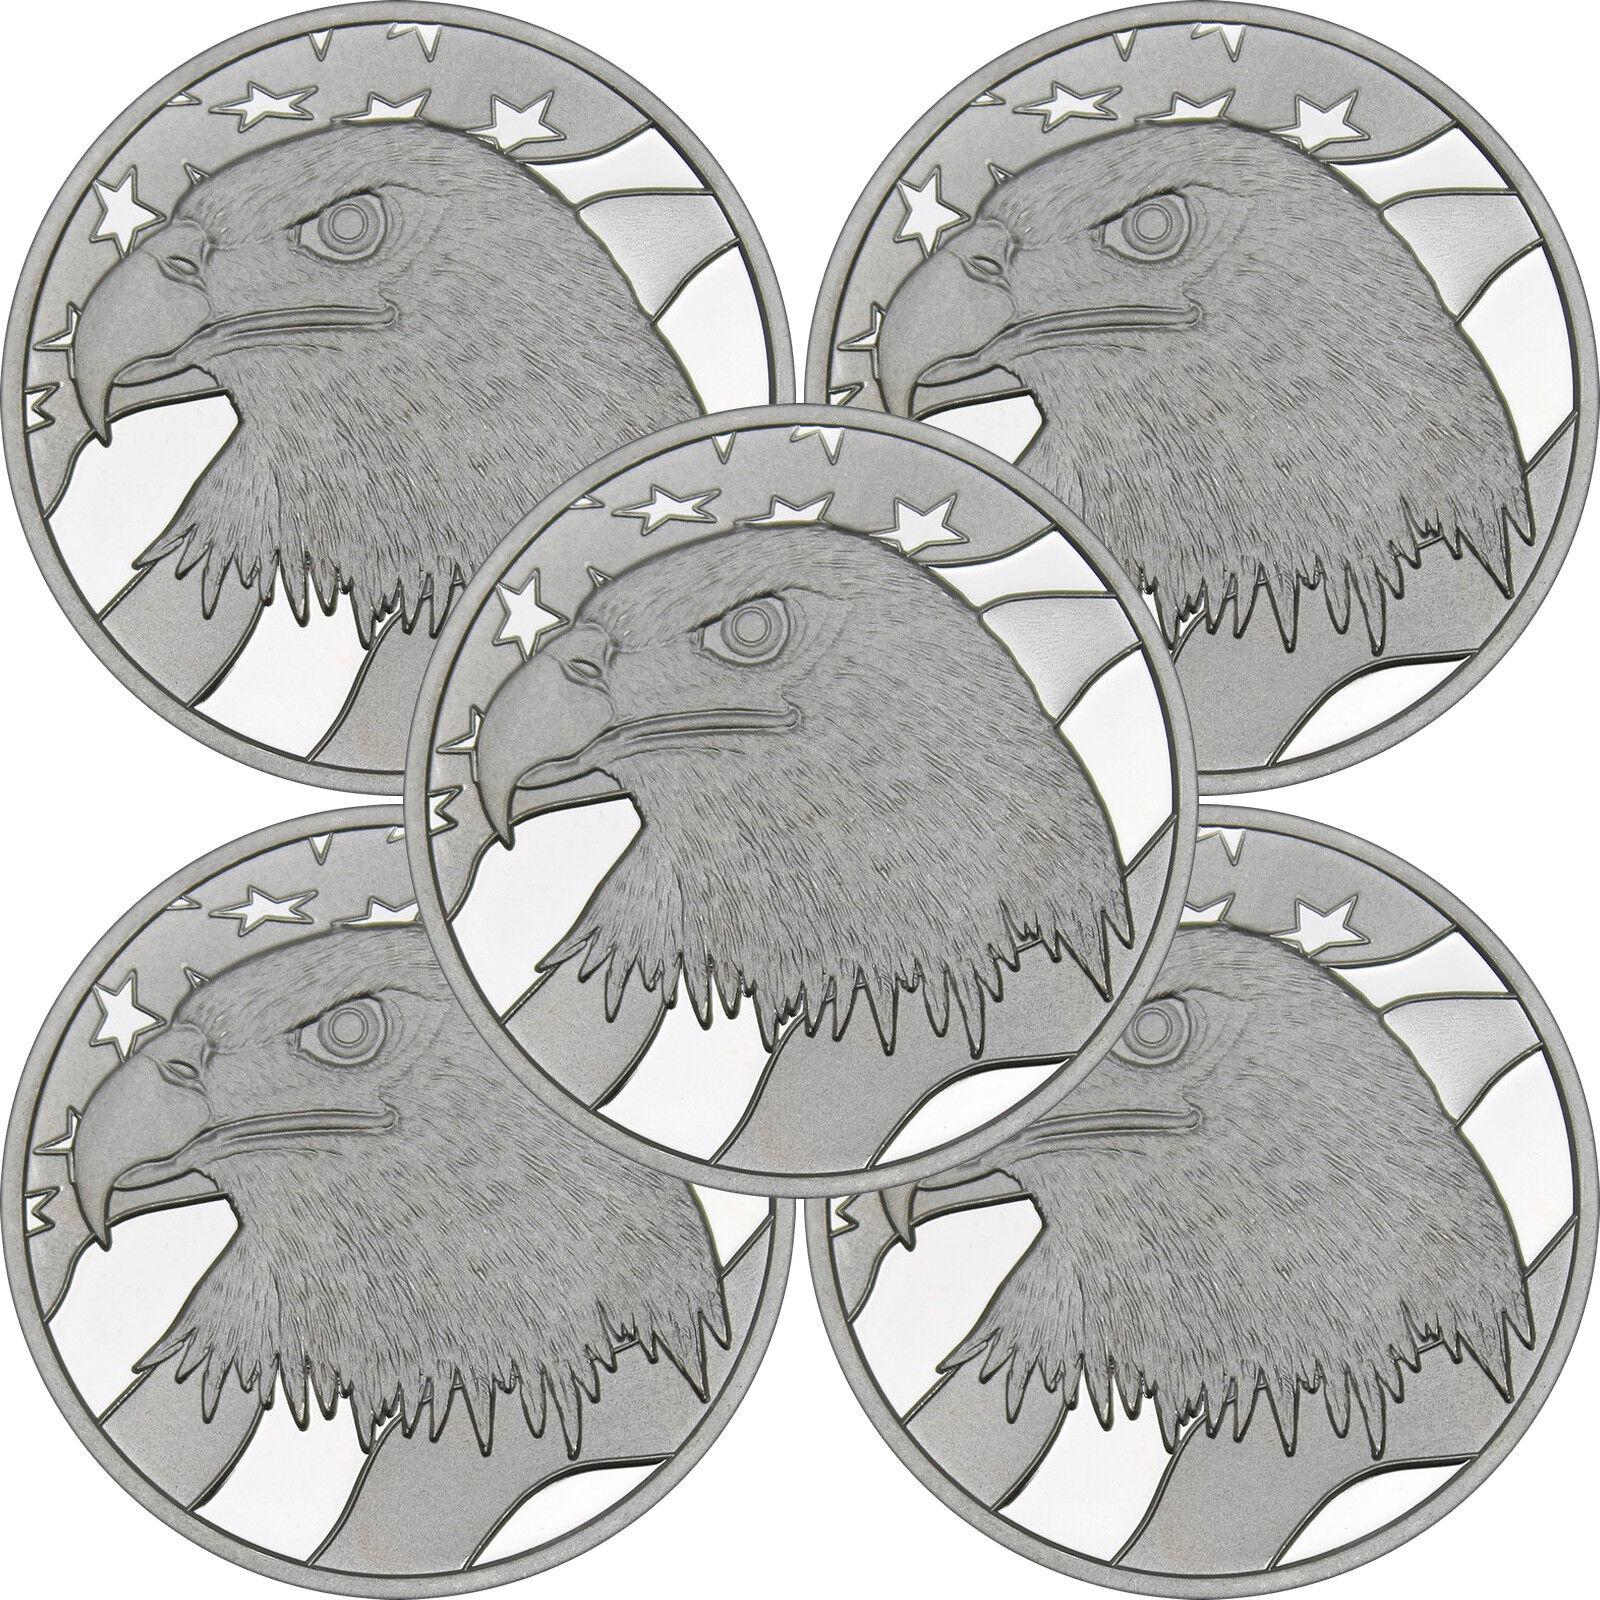 Купить Pledge of Allegiance Silver Eagle 1 oz .999 Silver Round LOT of 5